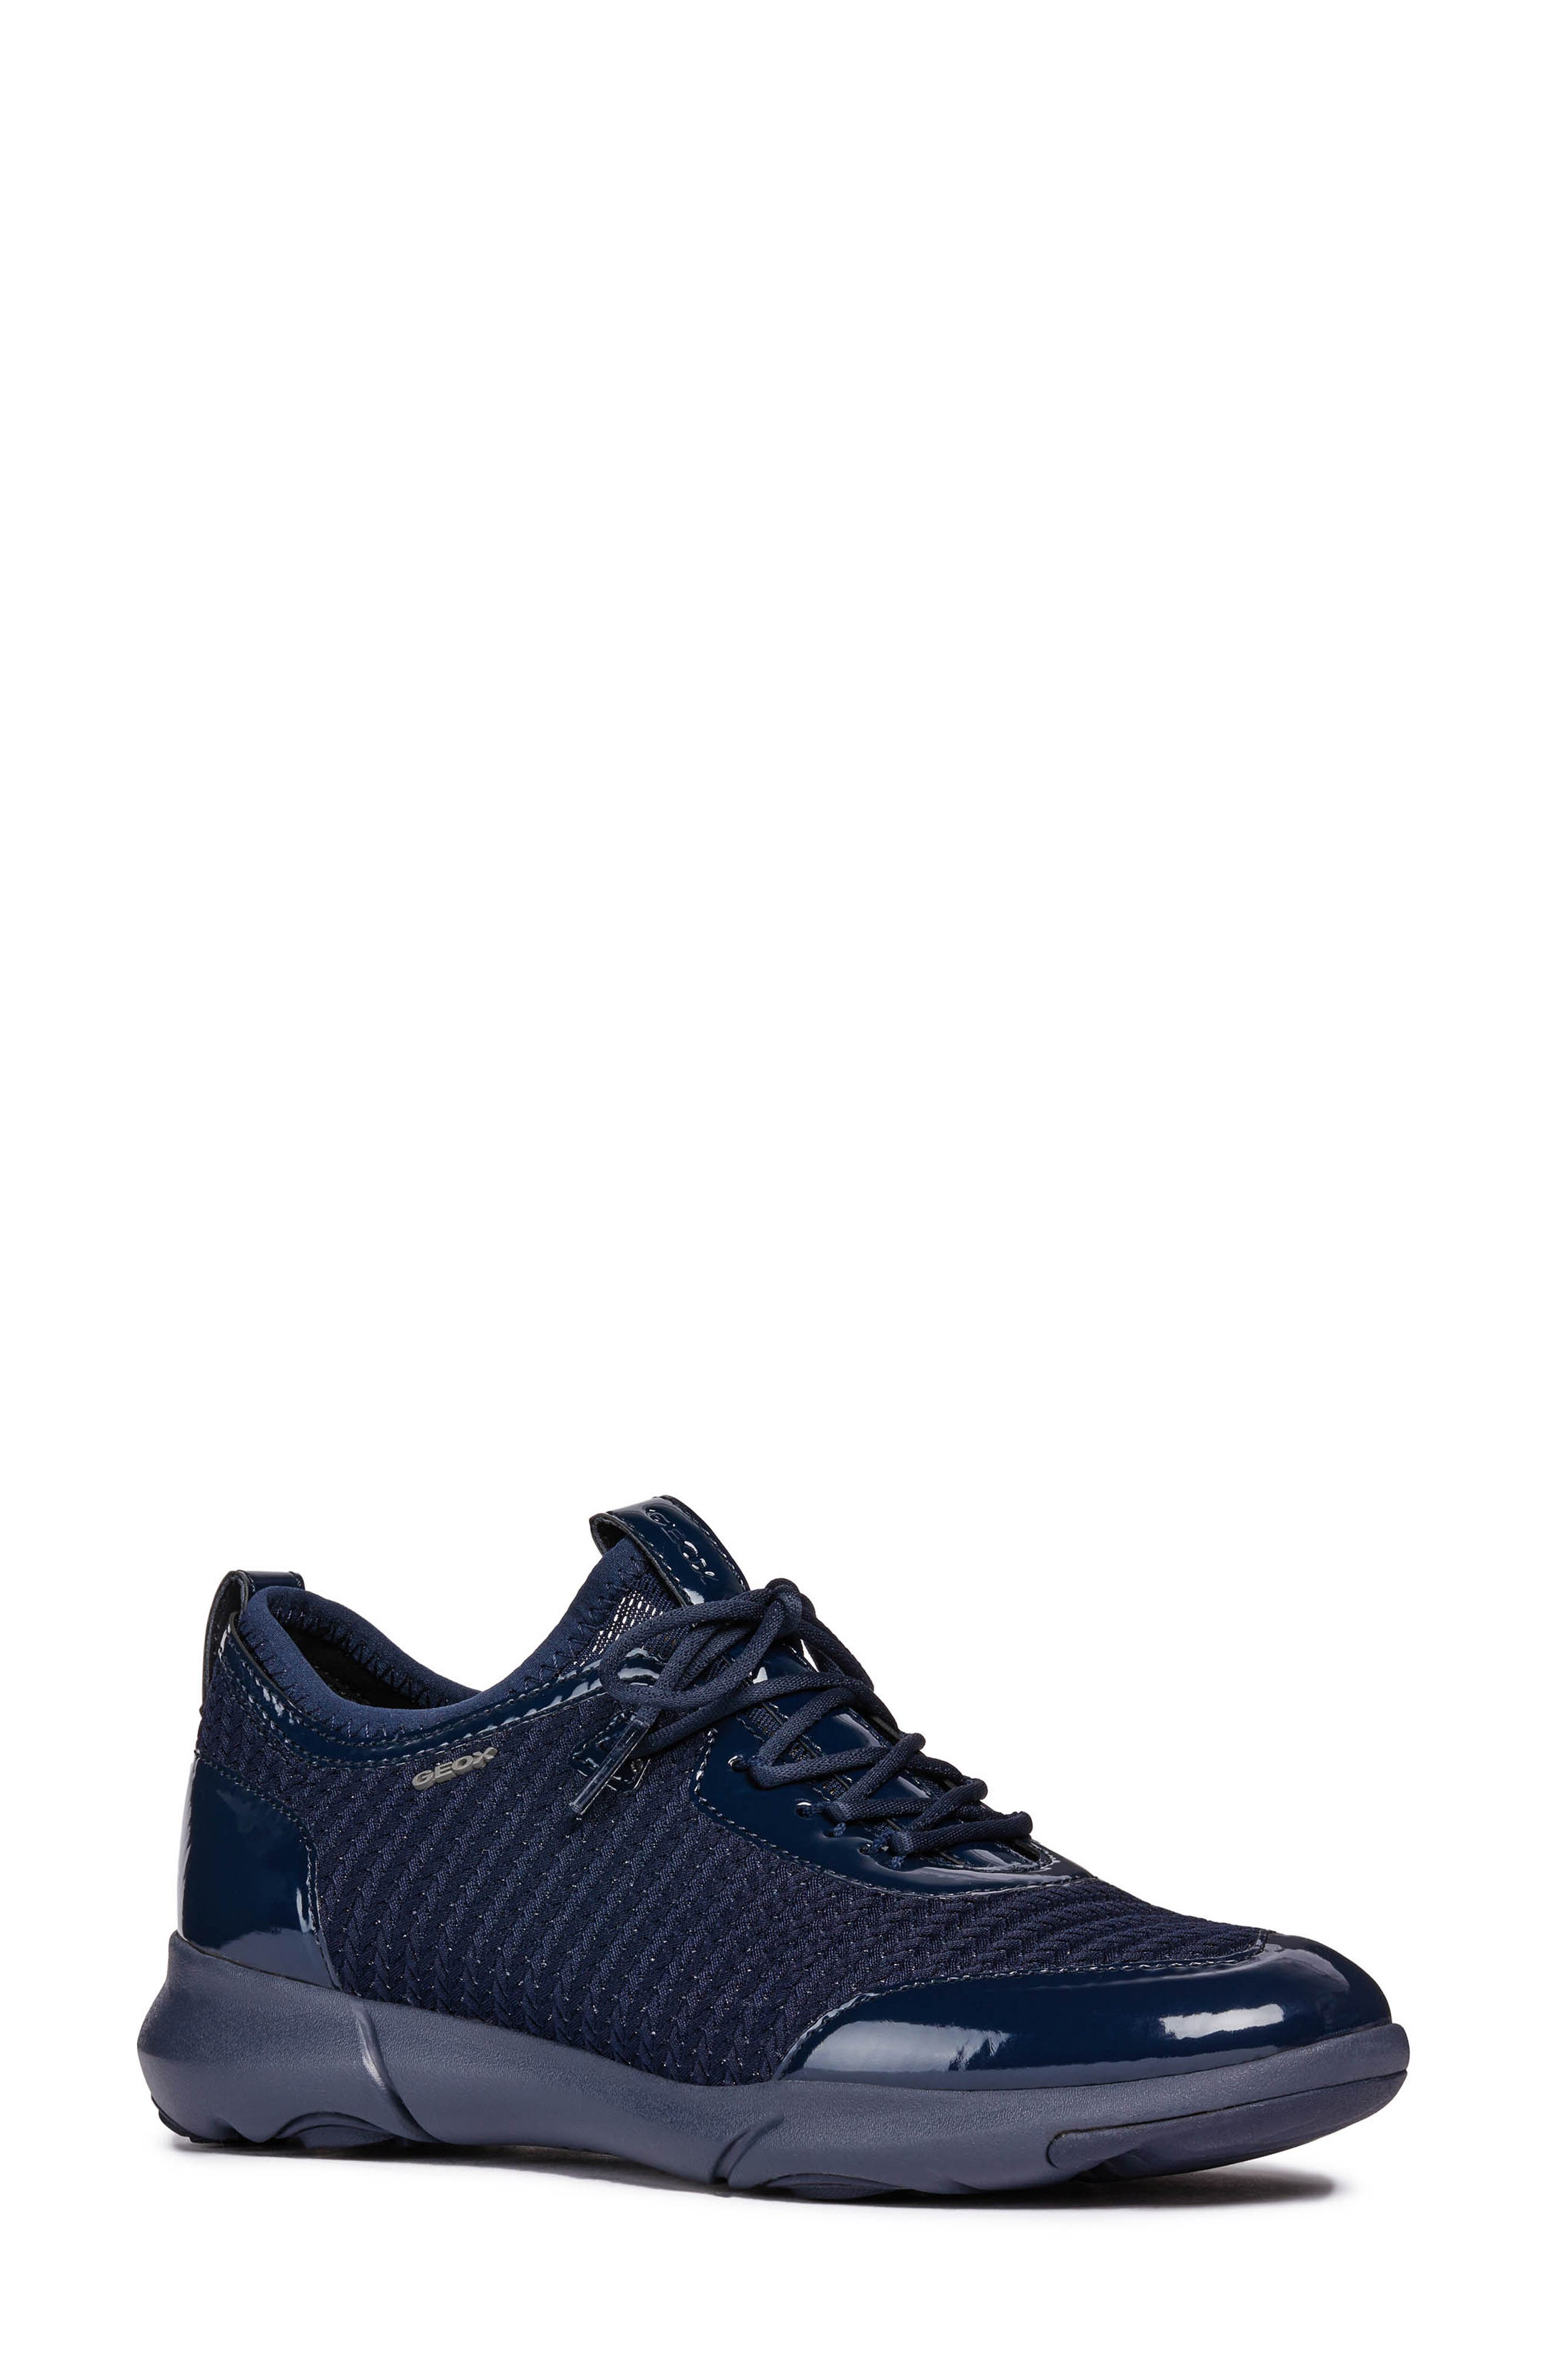 Nebula X Sneaker,                         Main,                         color, NAVY FABRIC